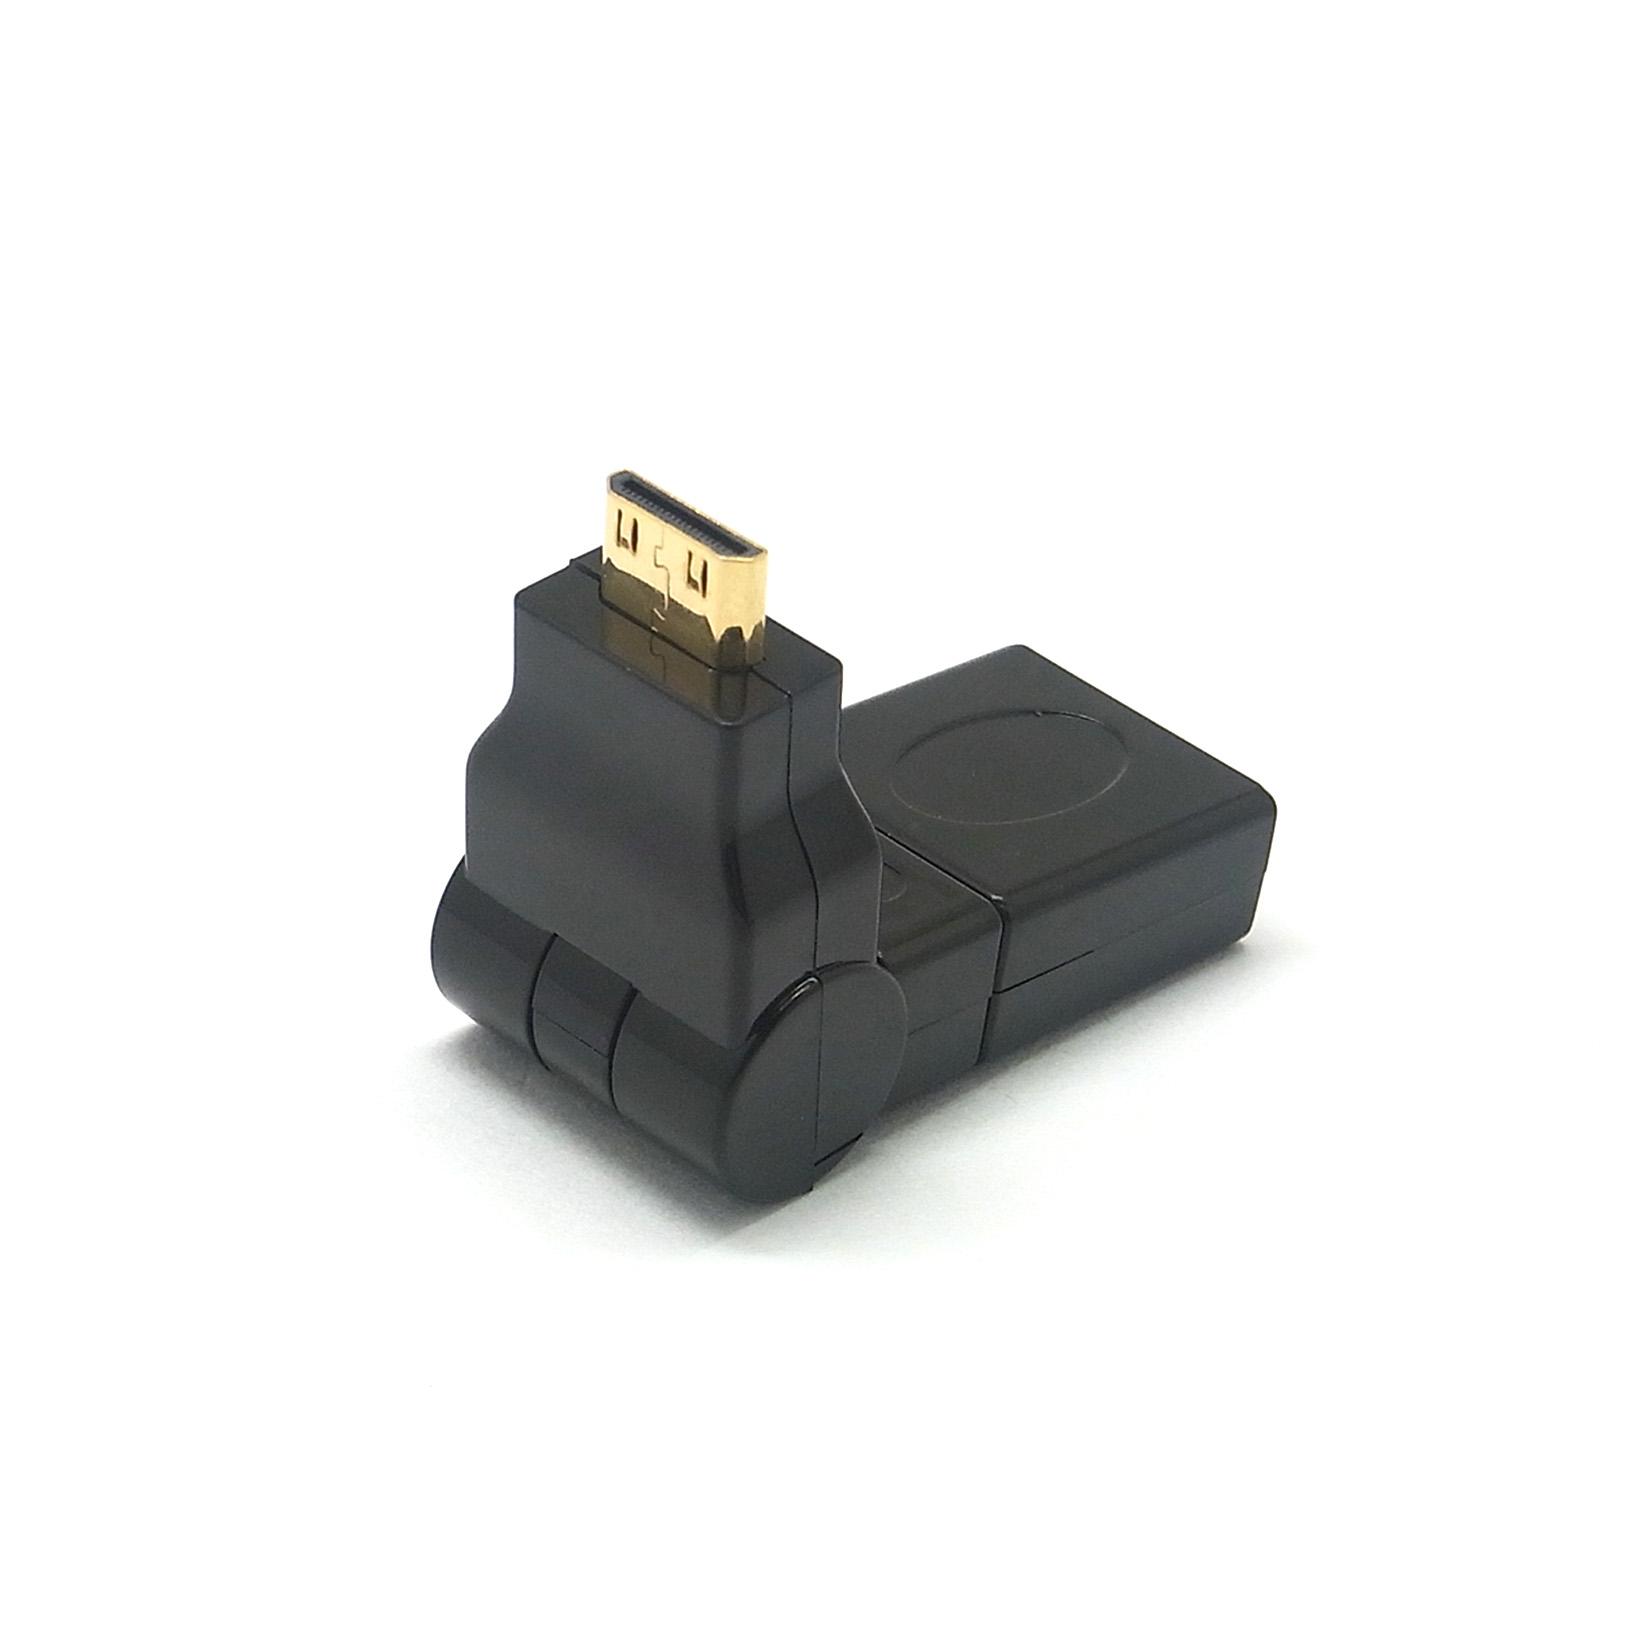 mini hdmi micro hdmi adapter zu auf hdmi stecker buchse kupplung winkel ebay. Black Bedroom Furniture Sets. Home Design Ideas